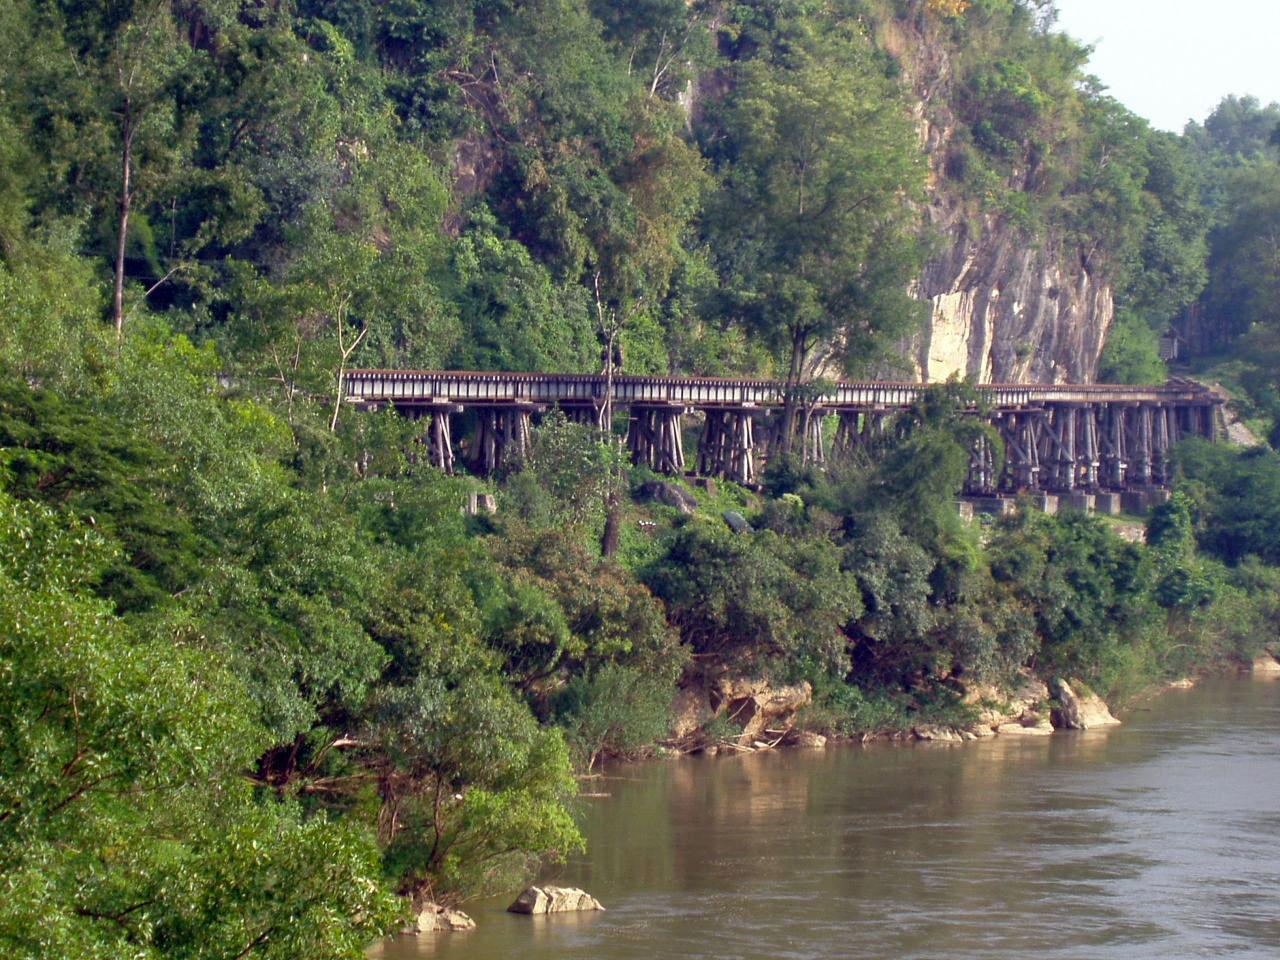 Ligne de chemin de fer Thaïlande - Birmanie - Tham Krasae